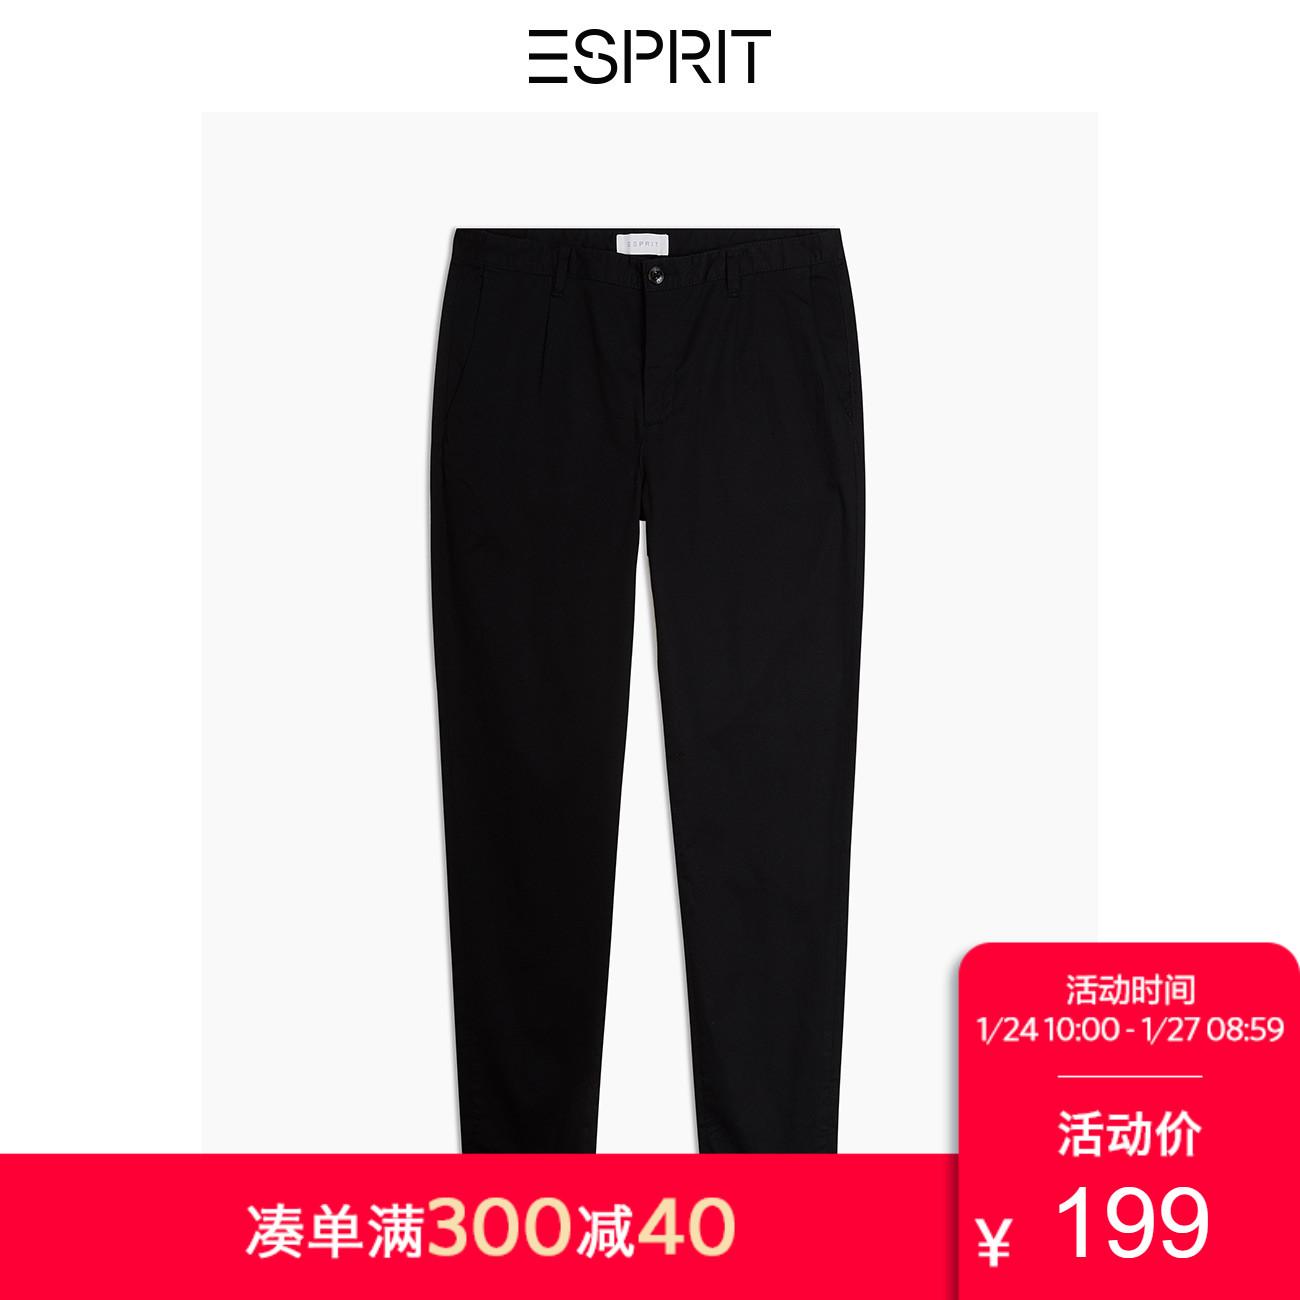 ESPRIT 男装秋冬潮流简约棉弹直筒长裤休闲裤子男-108EE2B016